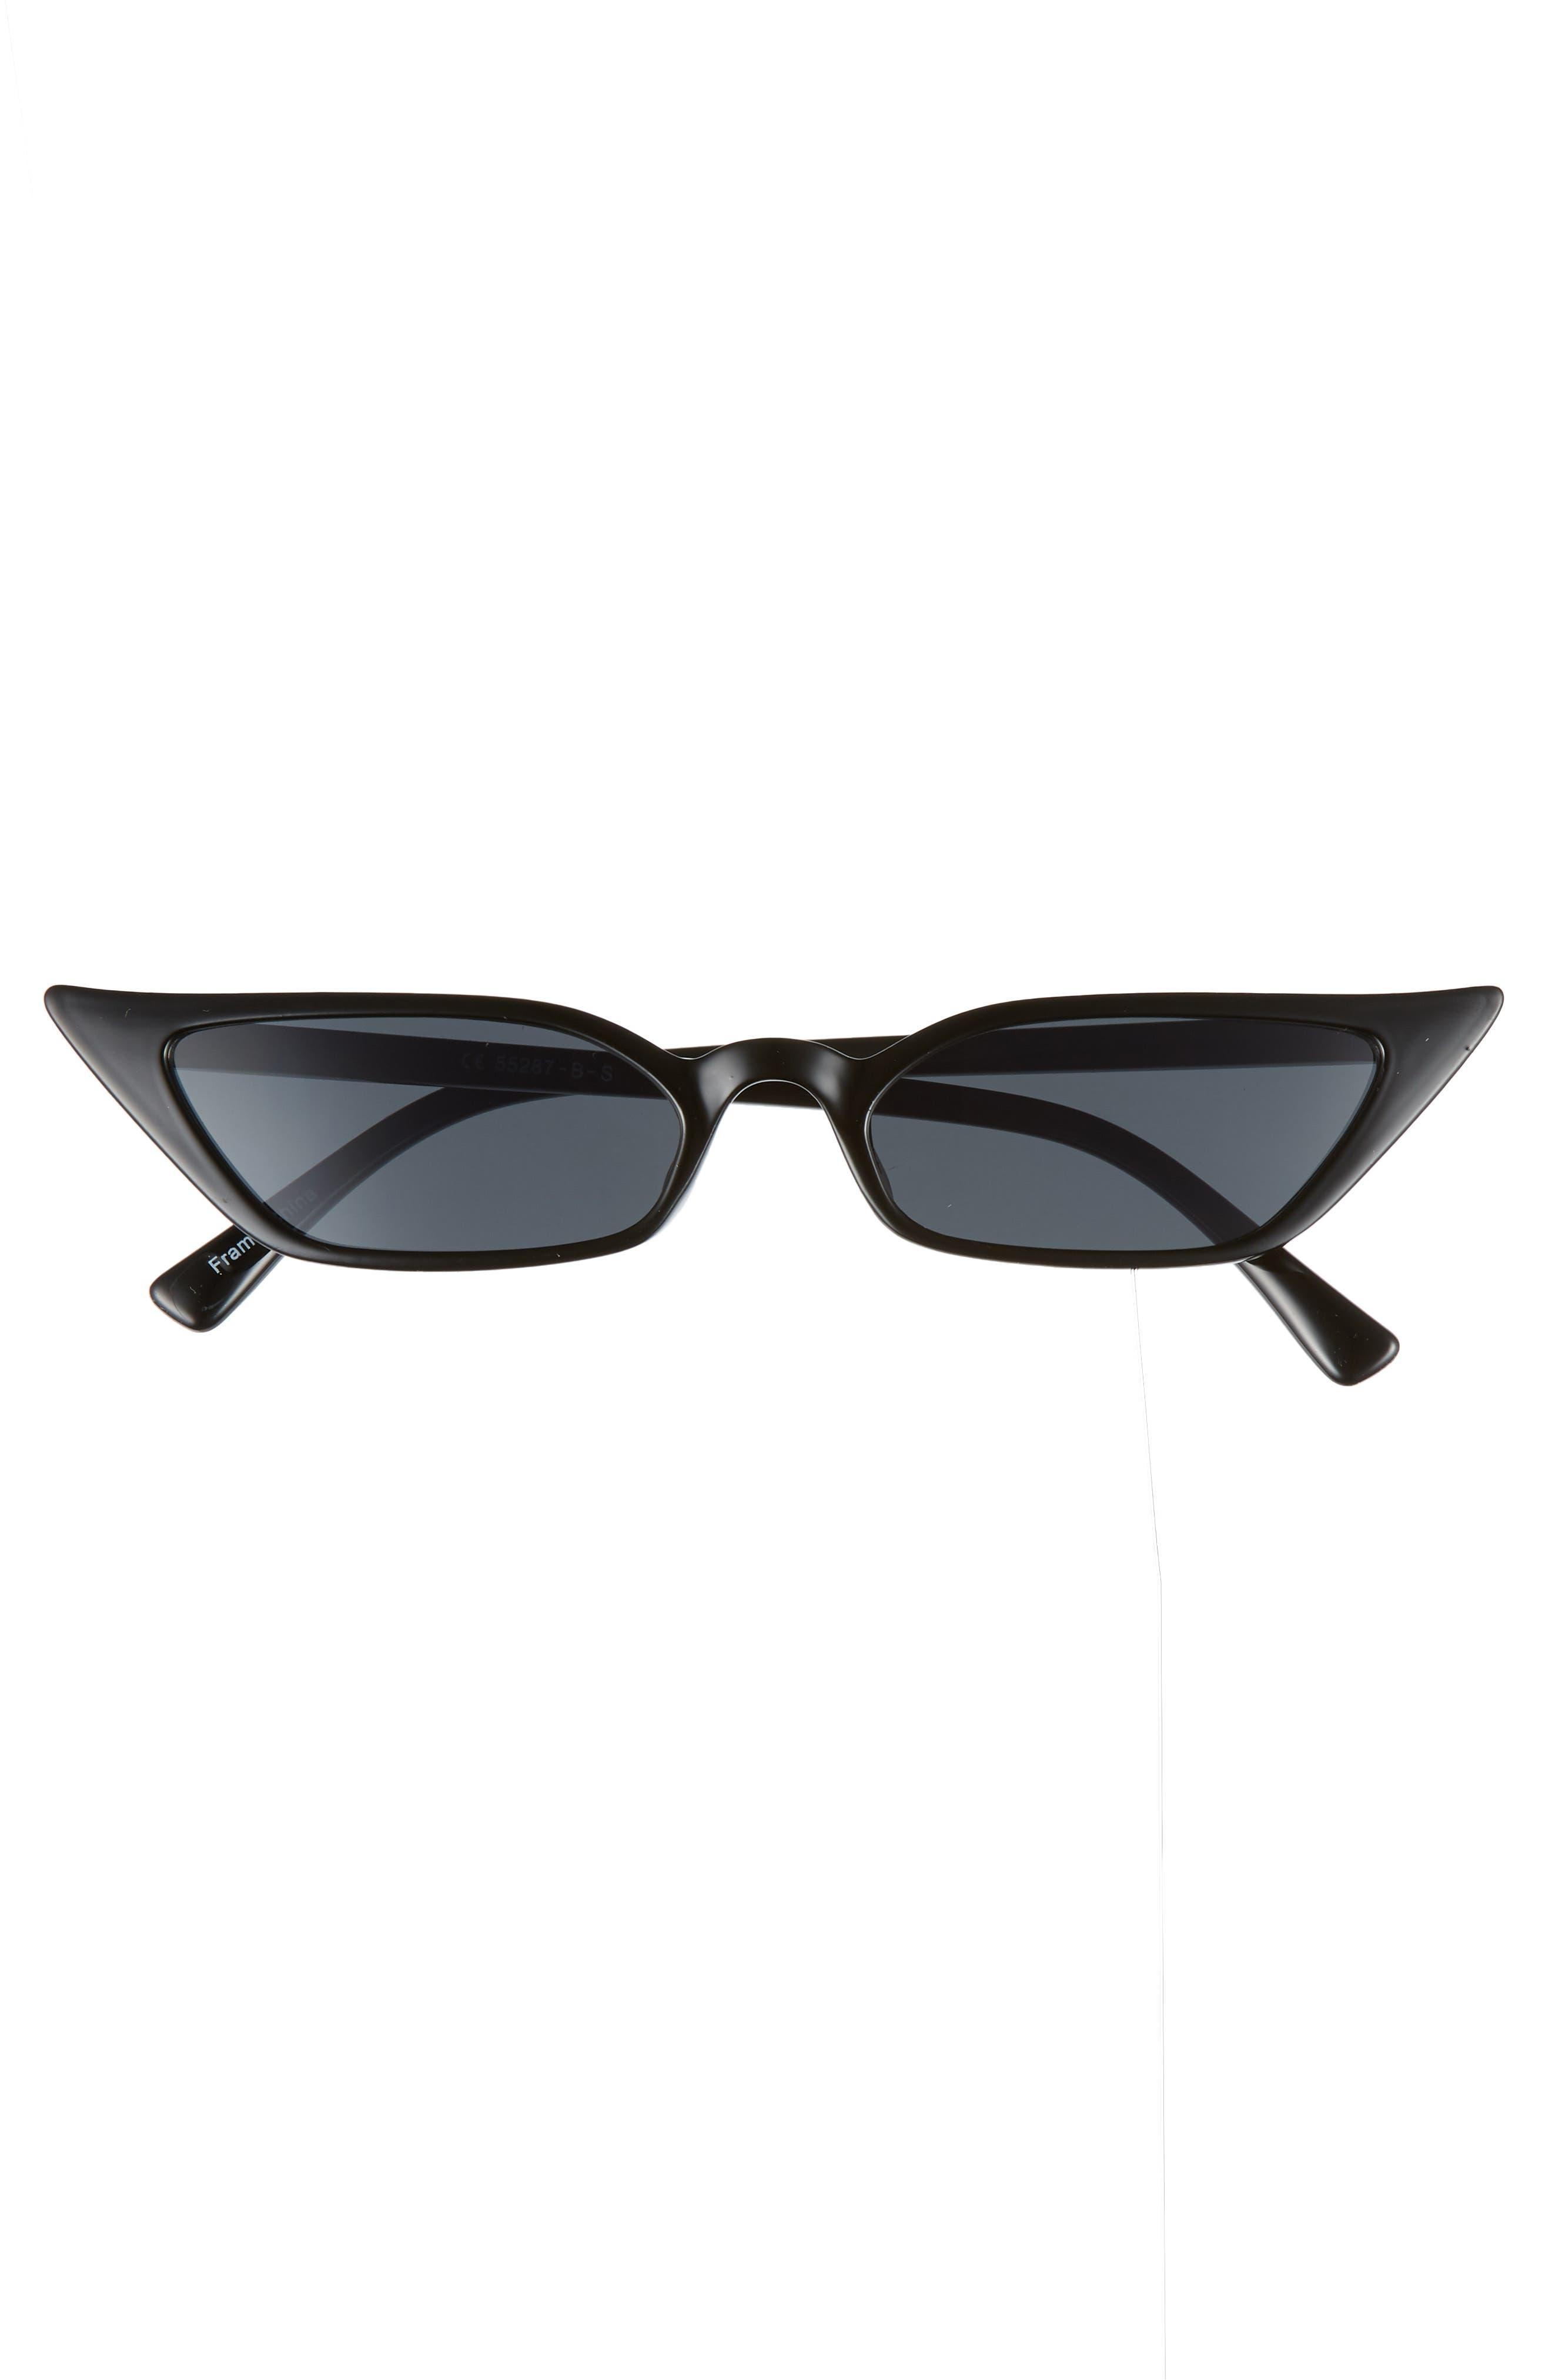 52mm Cat Eye Sunglasses,                             Alternate thumbnail 3, color,                             BLACK/ SMOKE LENS